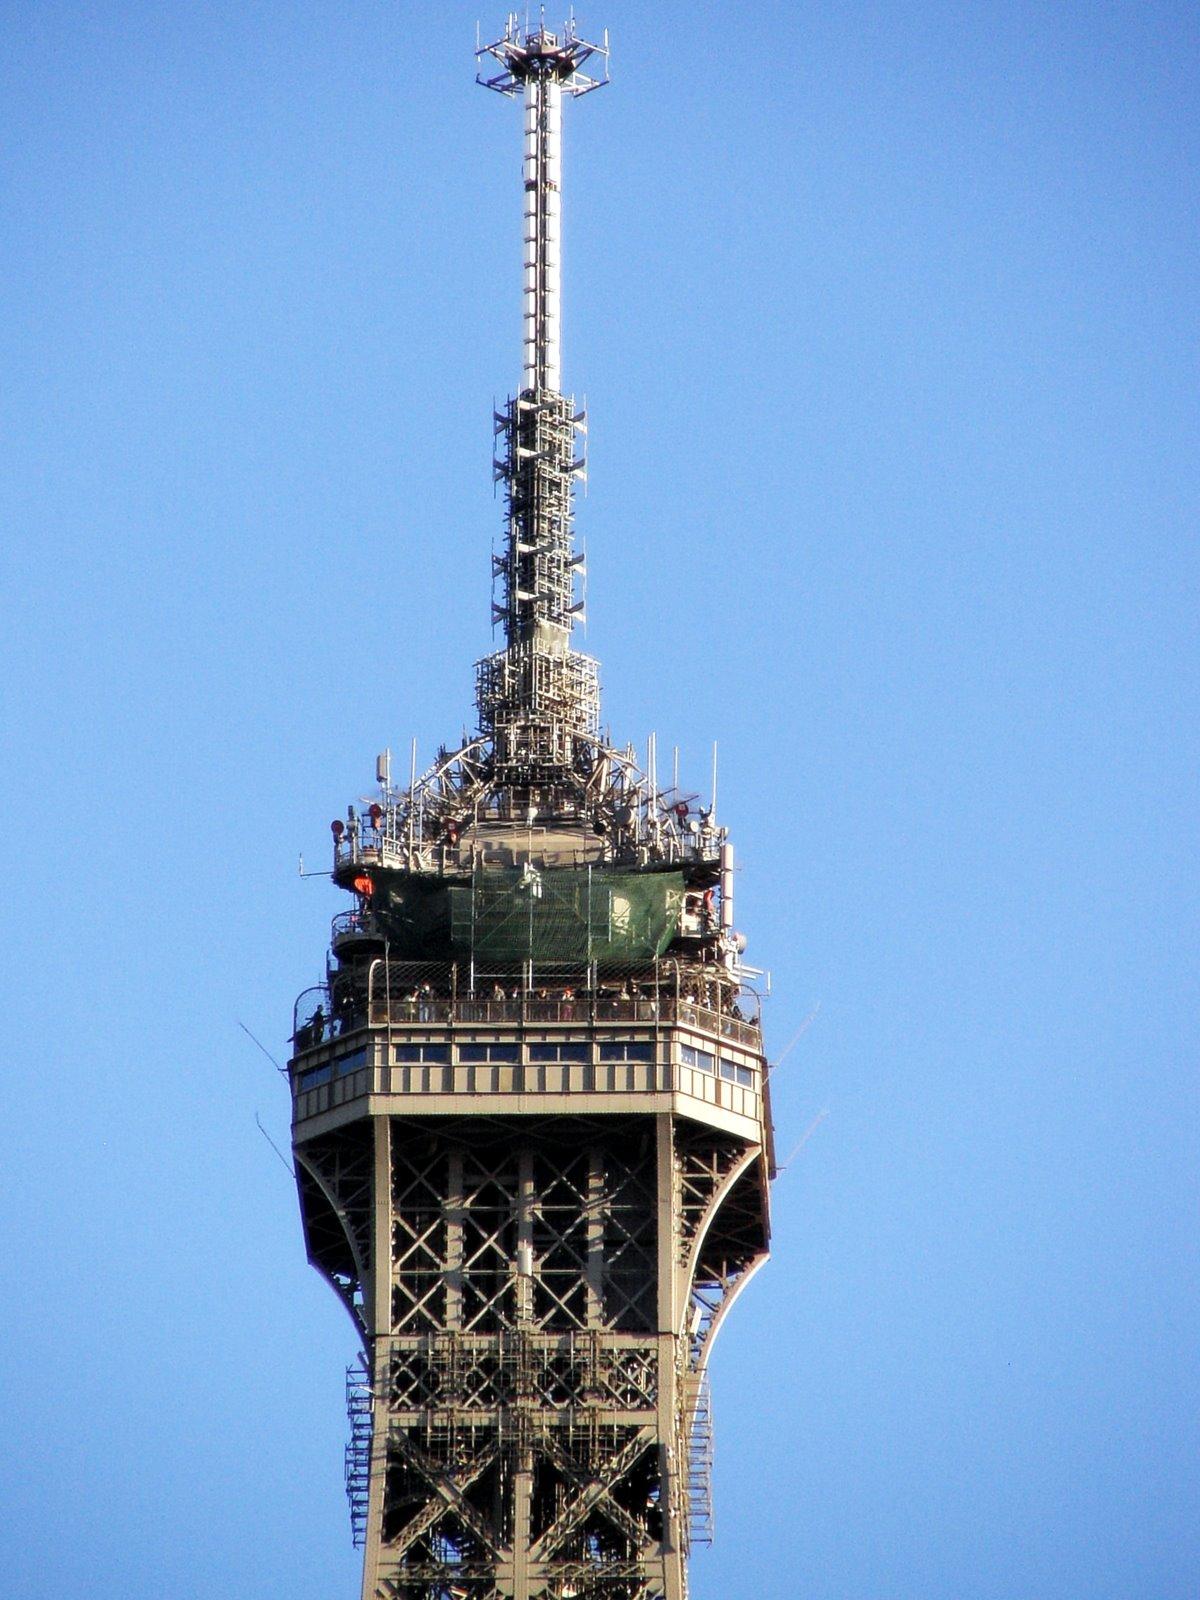 235 <b>Eiffel Tower</b> HD <b>Wallpapers</b> | <b>Backgrounds</b> - <b>Wallpaper</b> Abyss